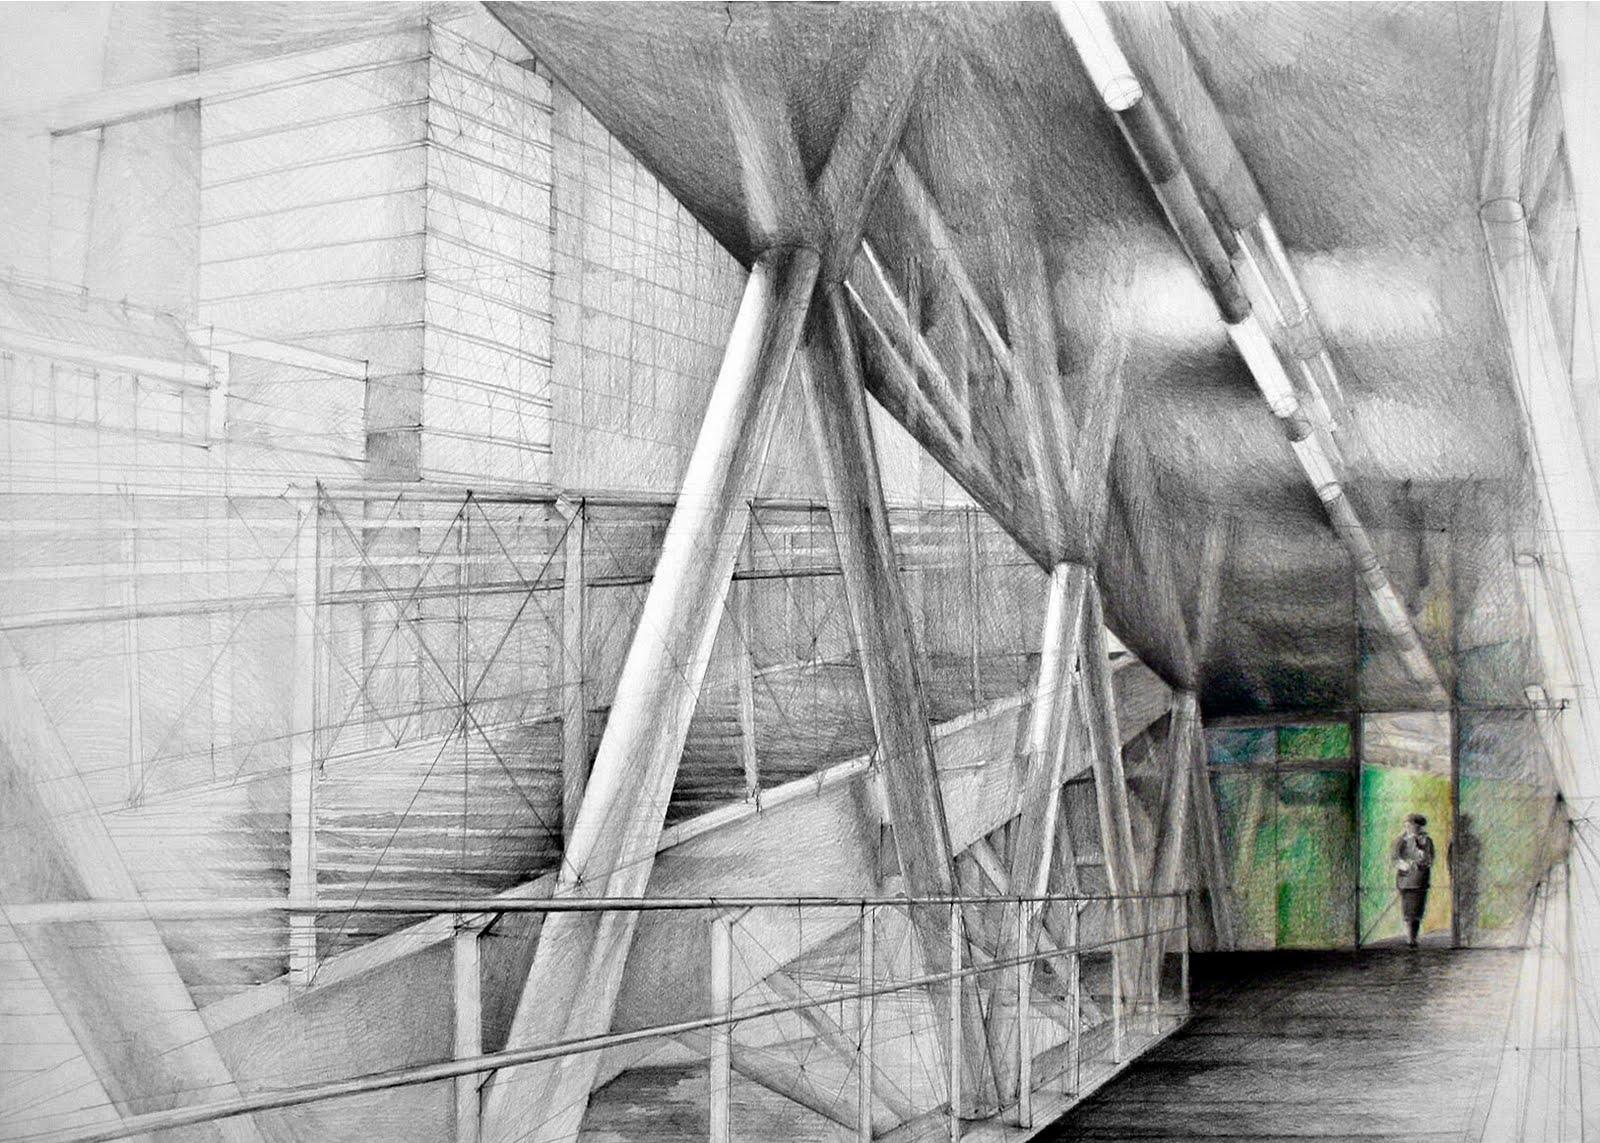 architectural drawings by klara